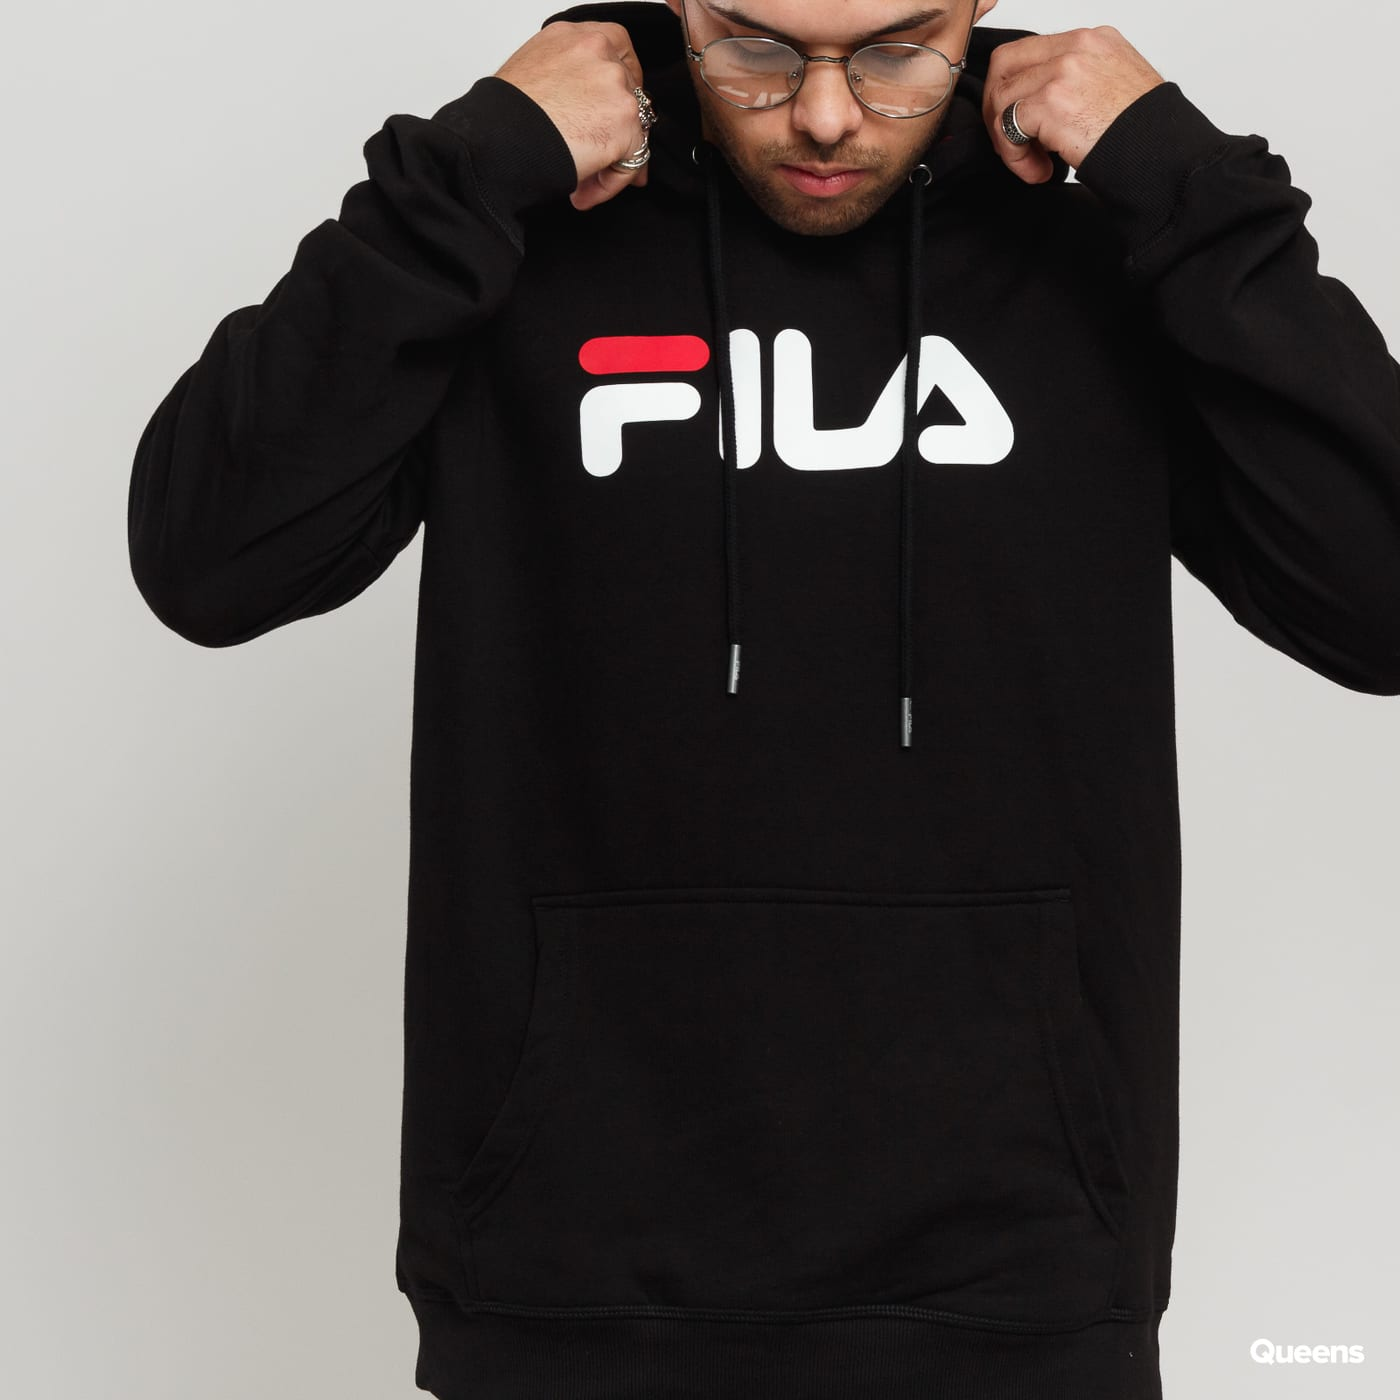 Fila Unisex Classic Pure Hoody black